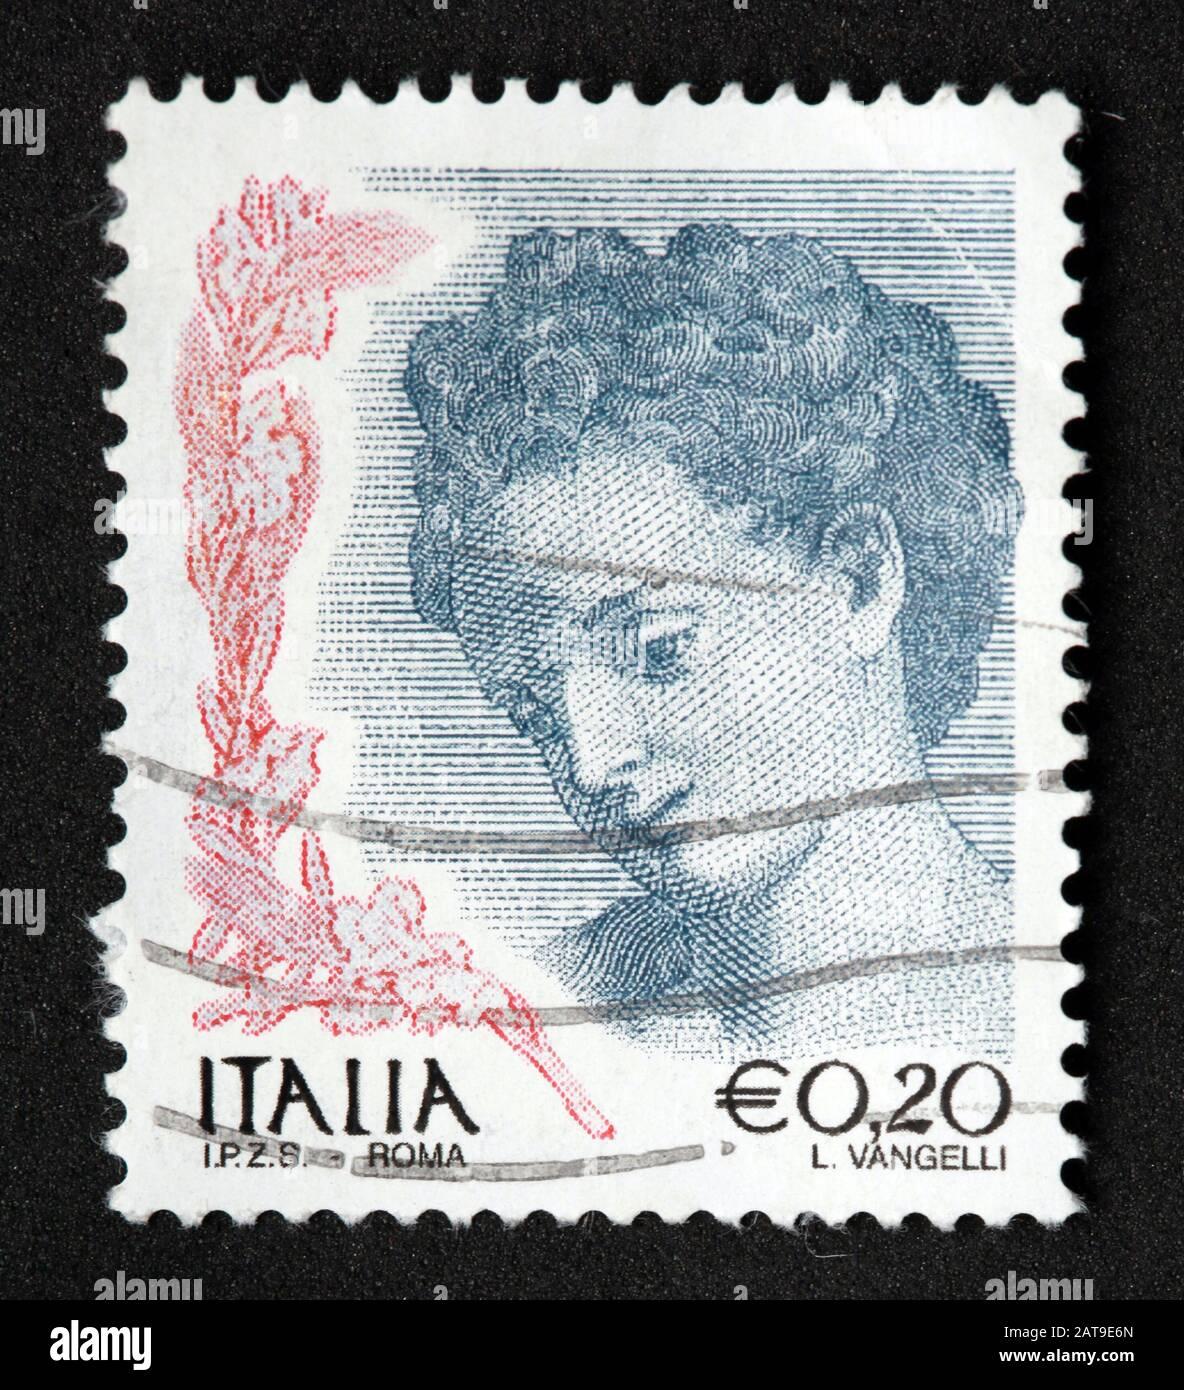 Hotpixuk,@Hotpixuk,GoTonySmith,stamp,postal,franked,frank,used stamps,used franked,used,franked stamp,from envelope,history,historic,old,Italy,Italian,Italia,Italy Stamp,italian stamp,franked Italian stamp,used Italian stamp,Italy stamp,face,portrait,E0.2,20c,20cent stamp,20c stamp,woman,female